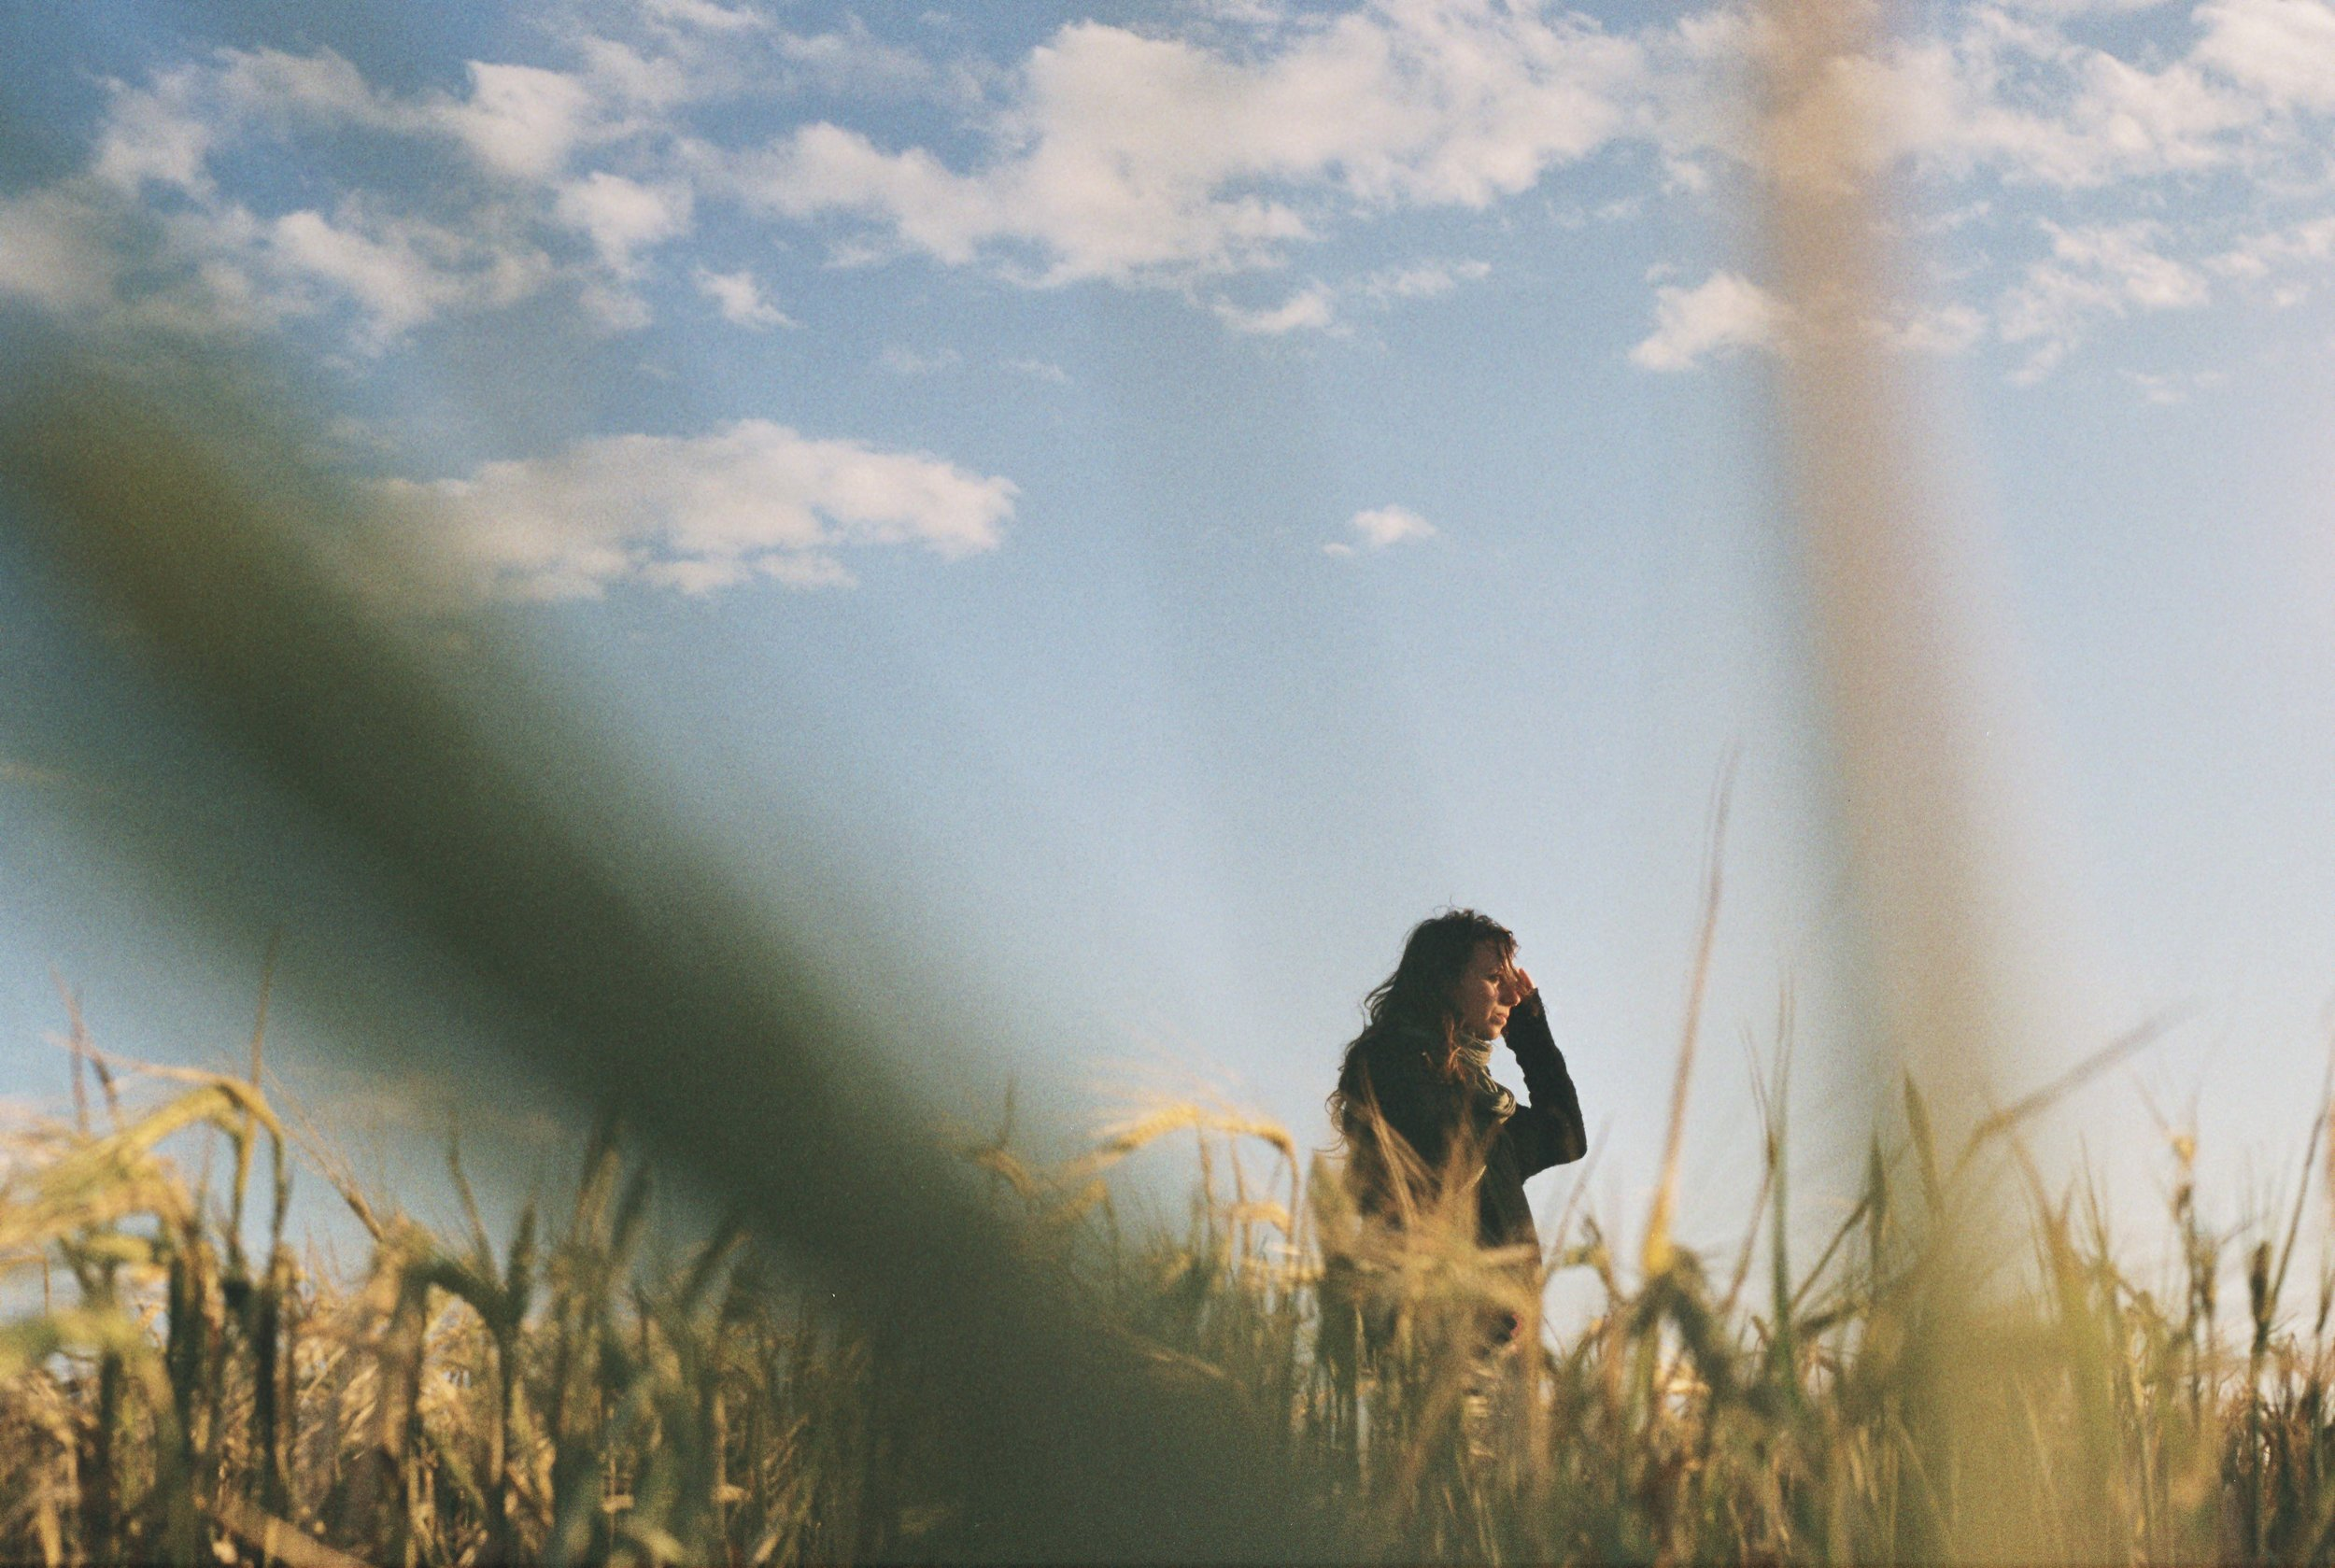 Los campos de trigo del Empordà | Foto: Maria Larreina